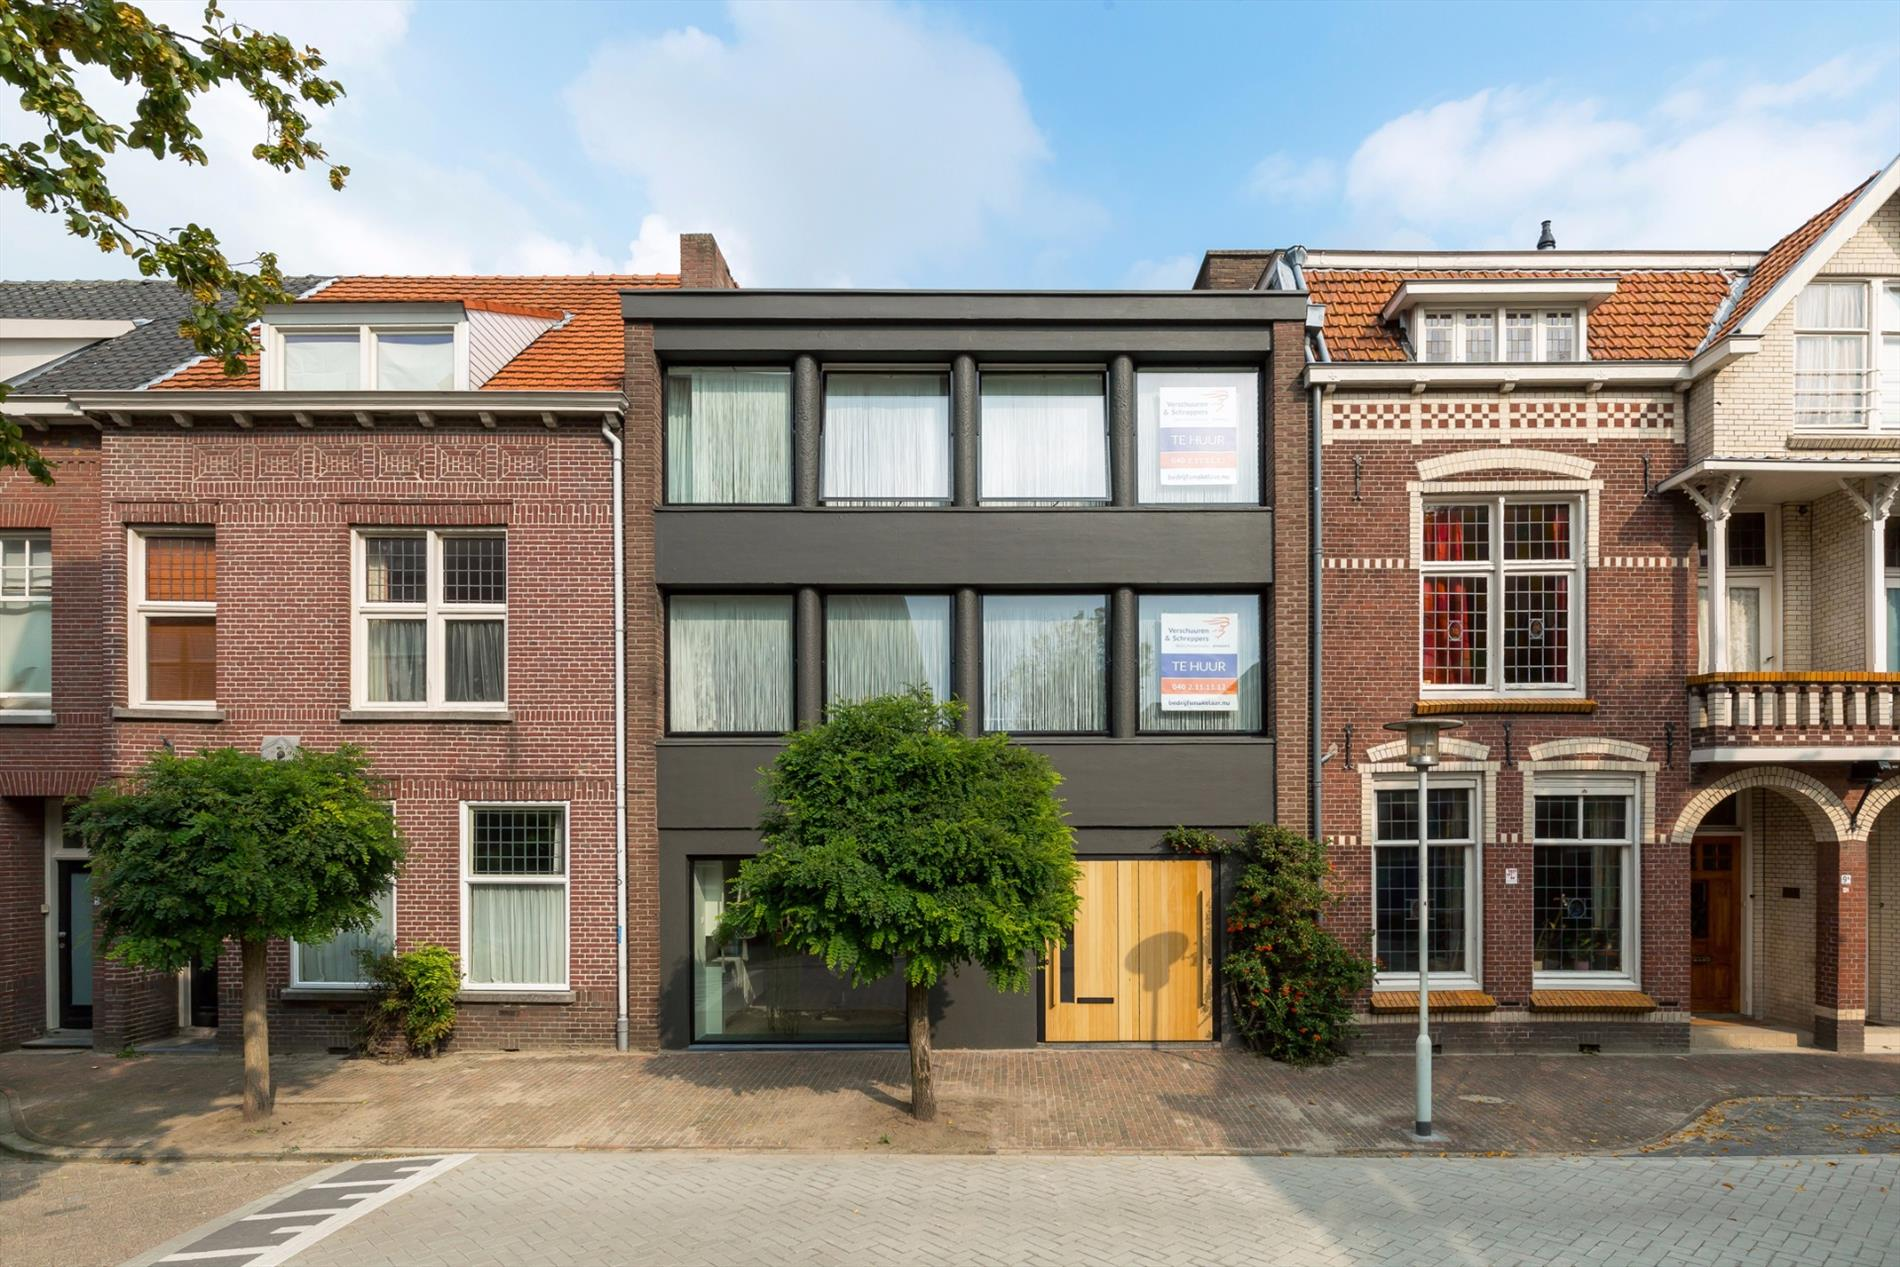 St Catharinastraat, Eindhoven